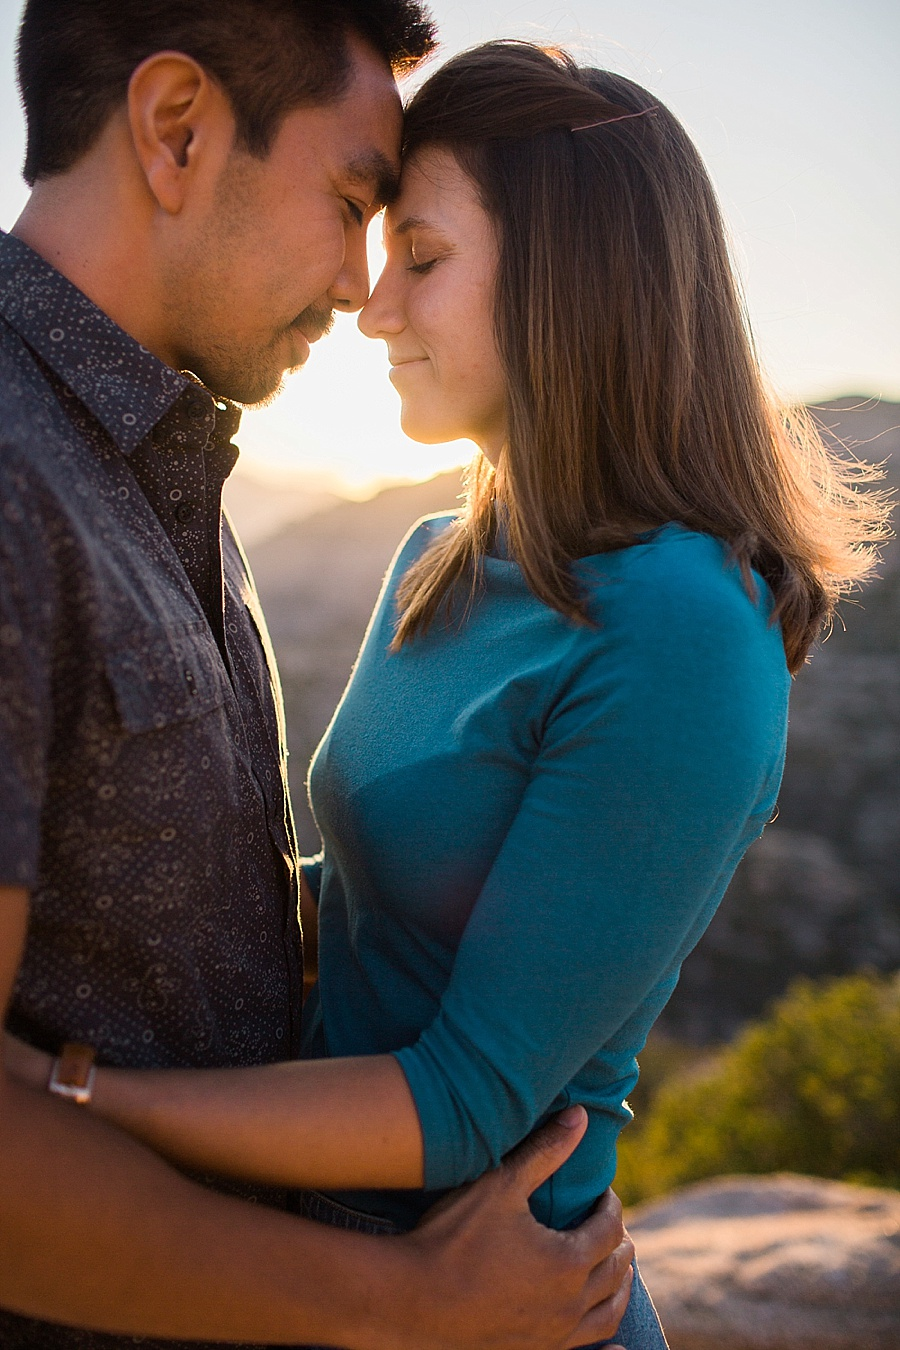 JR_Magat_Photography_Arizona_Engagement_Session_0019.jpg